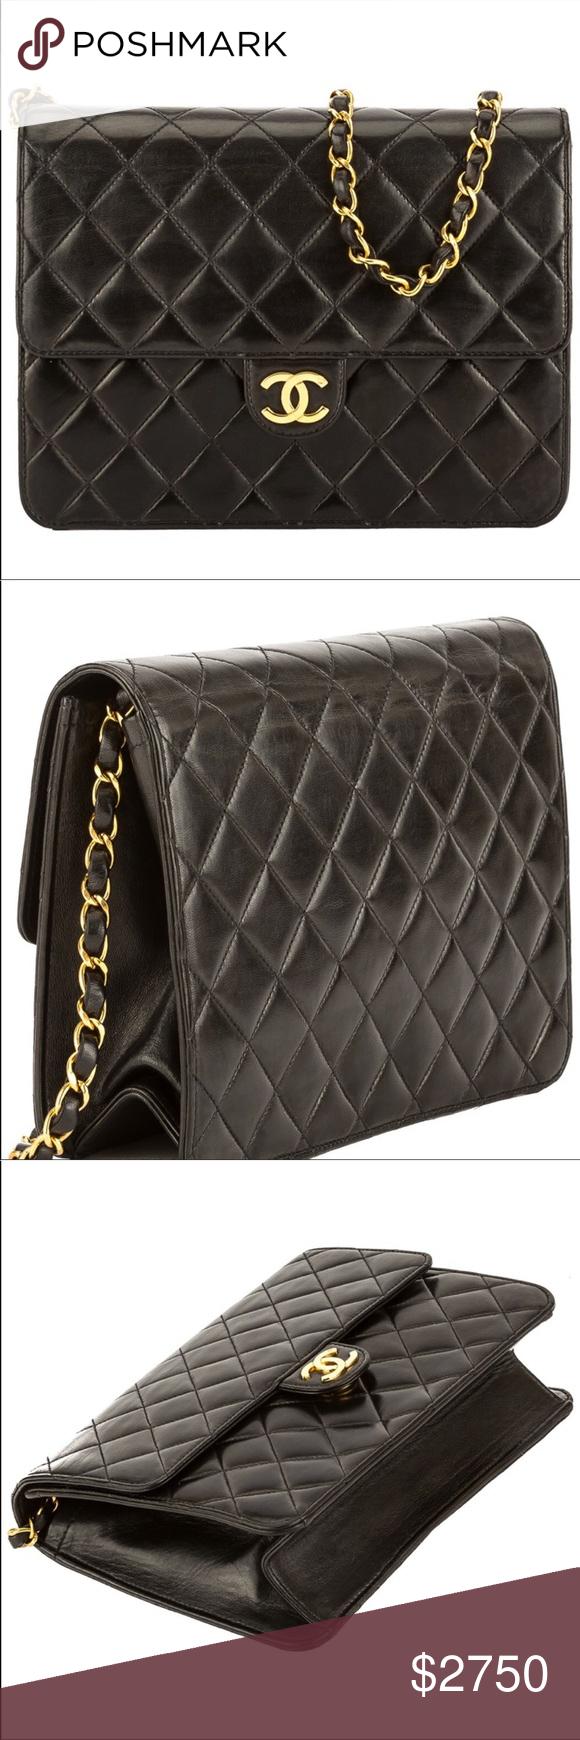 Vintage Wgaca Ex Chanel Quilted Flap Bag My Posh Picks